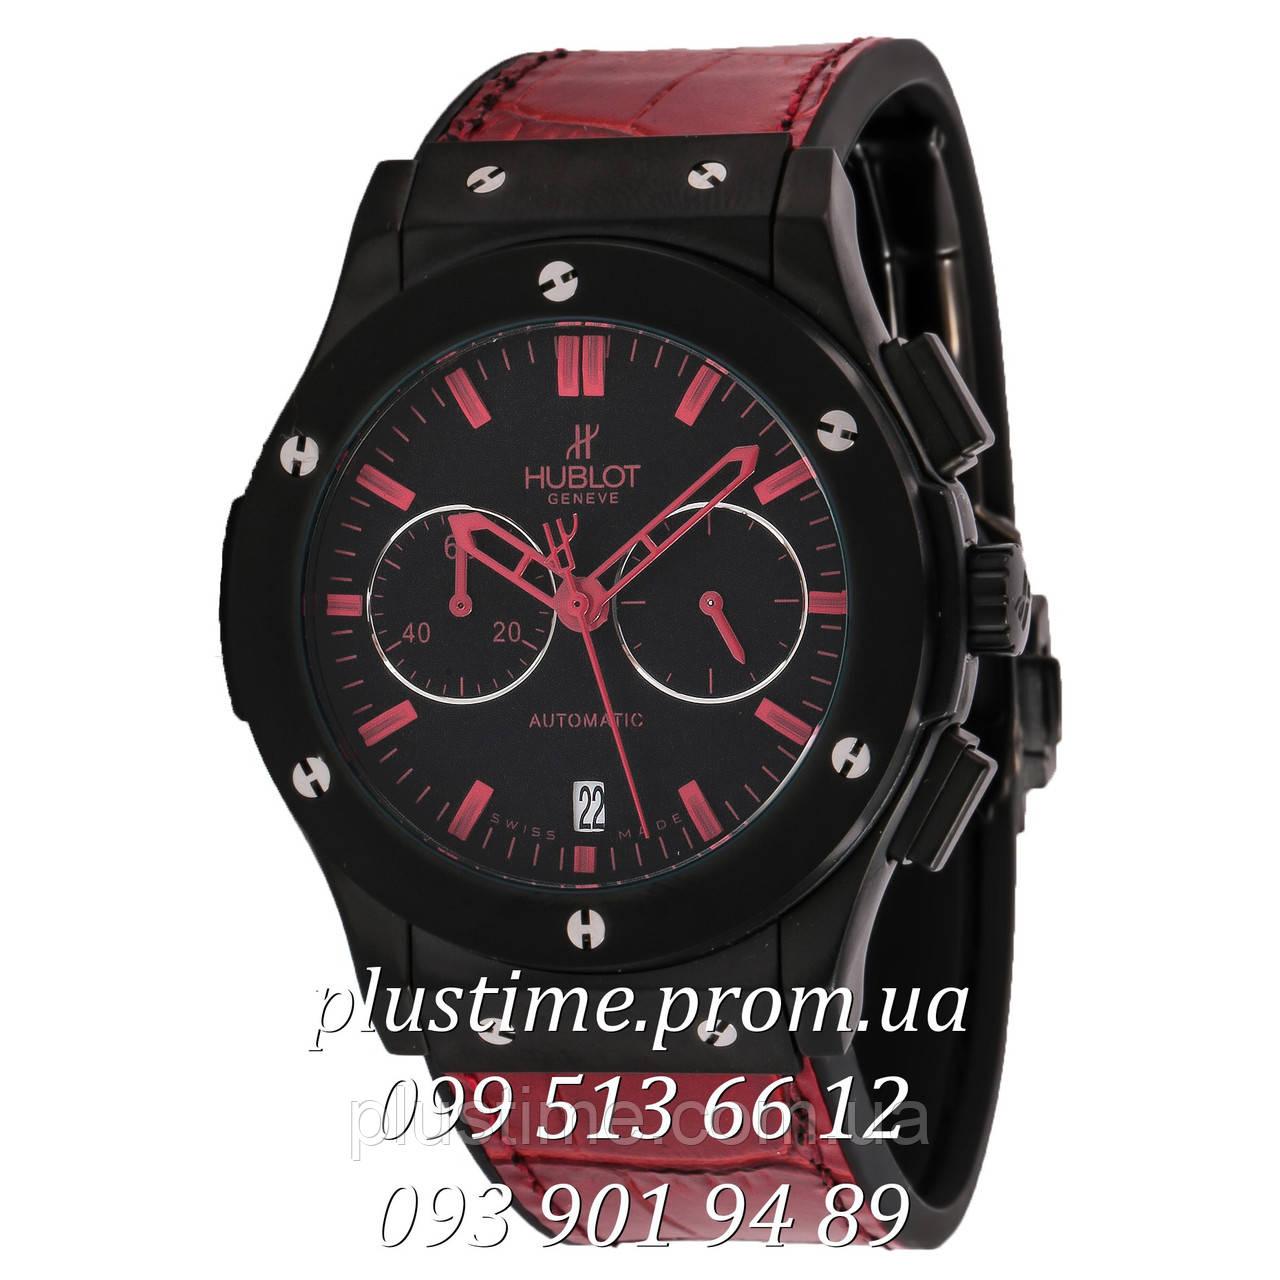 Часы кварц хронограф купить в куплю часы эпл бу